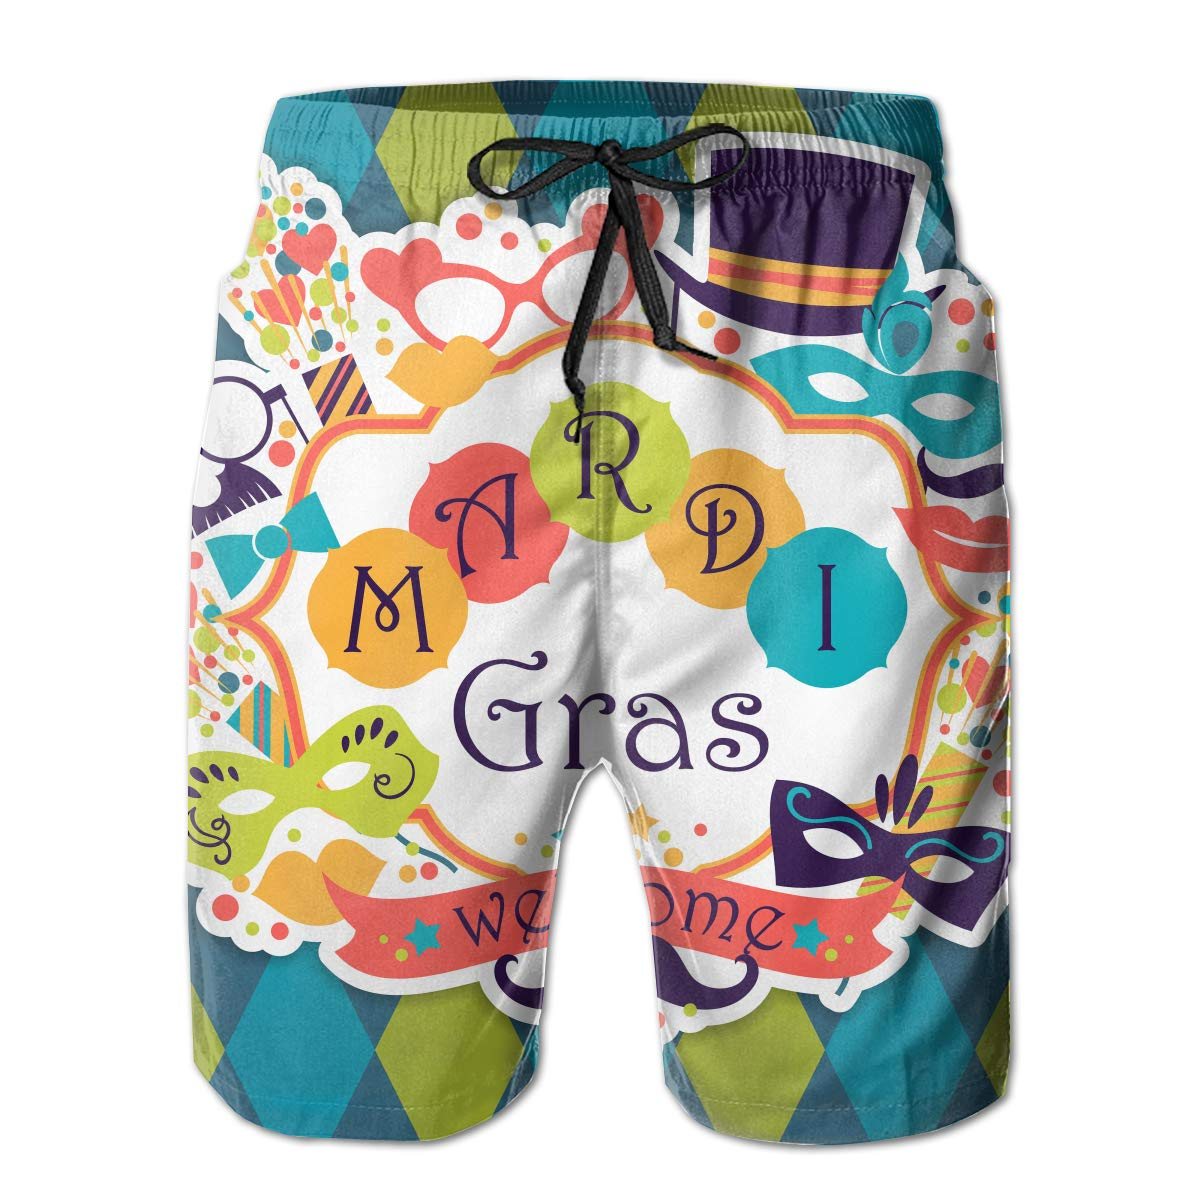 Fancy Illusion Mardi Gras Carnival Masks Cool Boys Mens Shorts Swim Trunks Board Shorts for Men